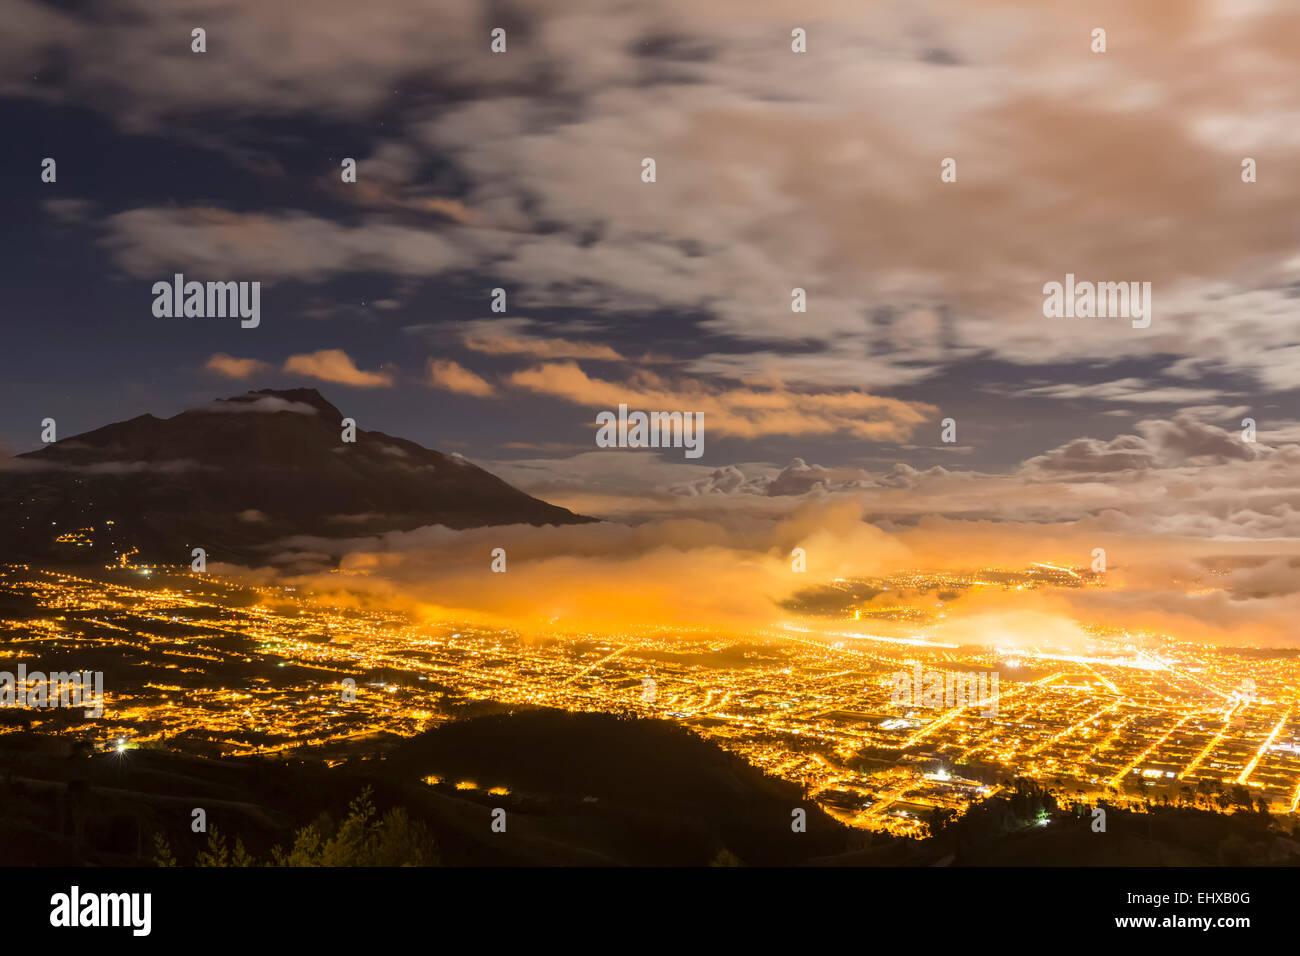 South America, Ecudador, Imbabura Province, Ibarra, Imbabura Volcano, Blue hour and fog - Stock Image